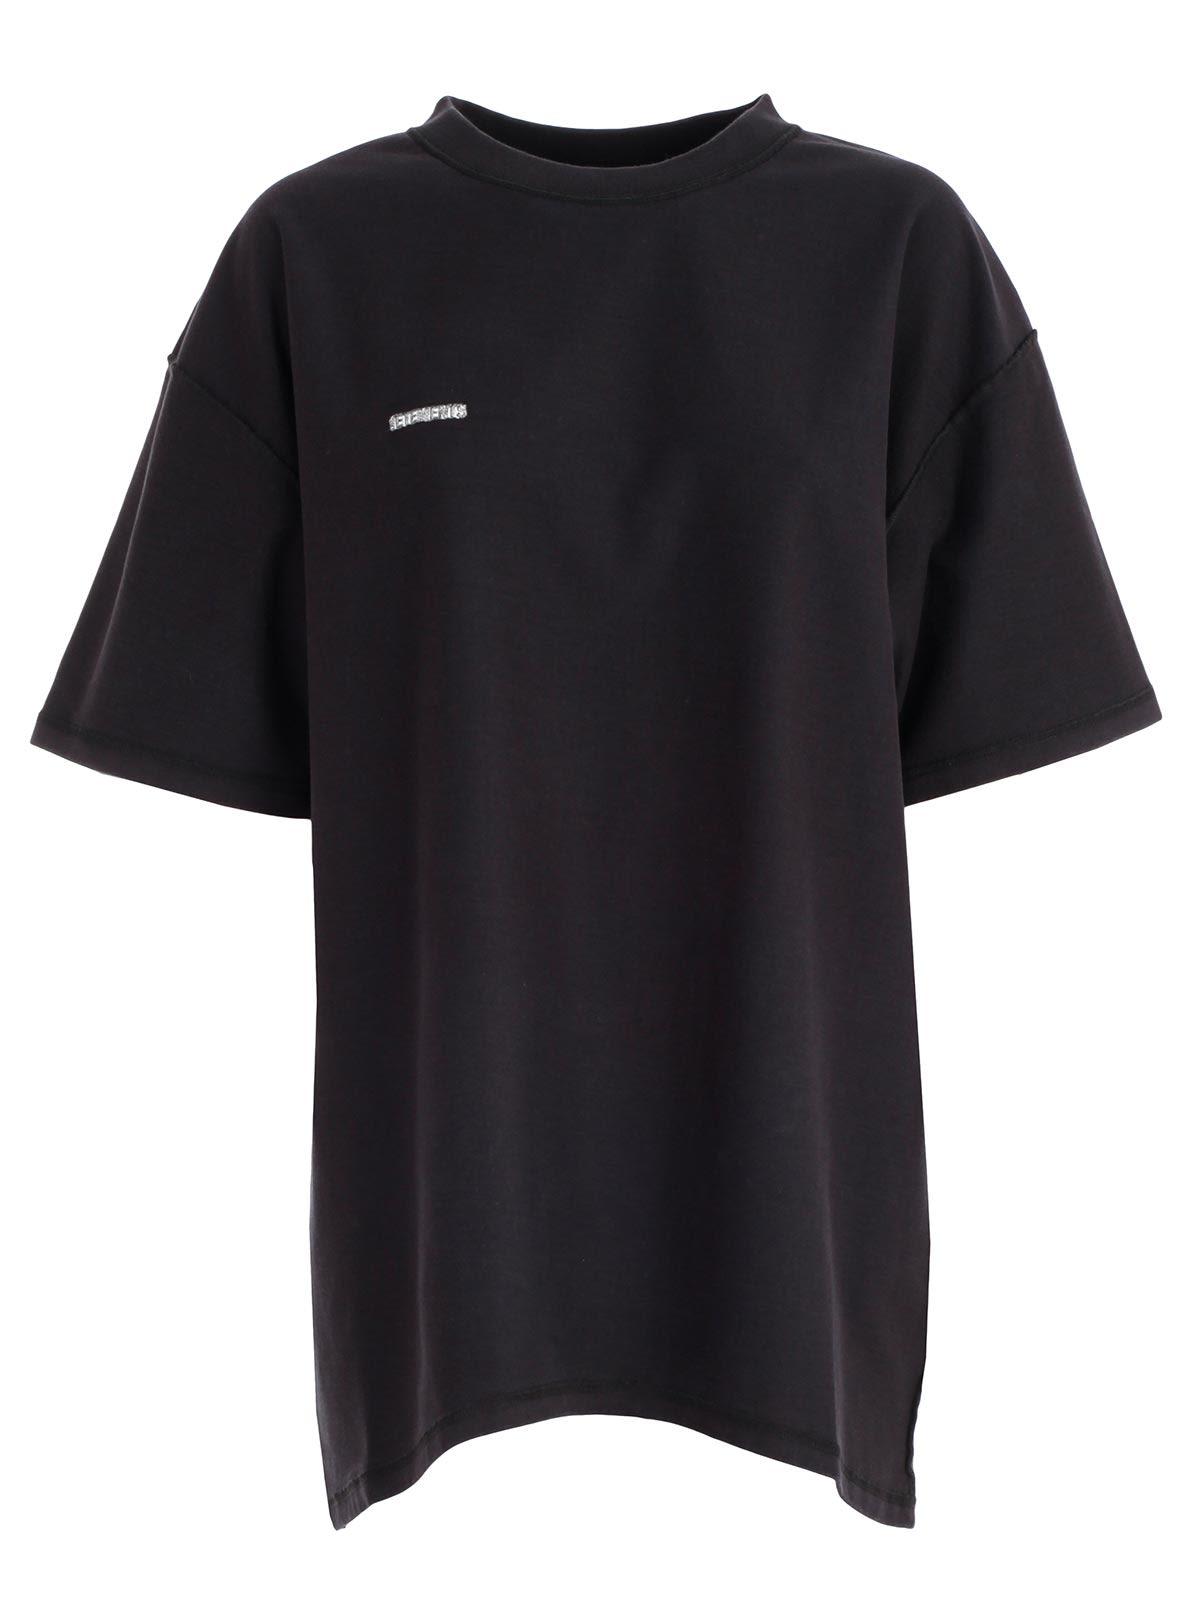 Vetements Oversized T-shirt